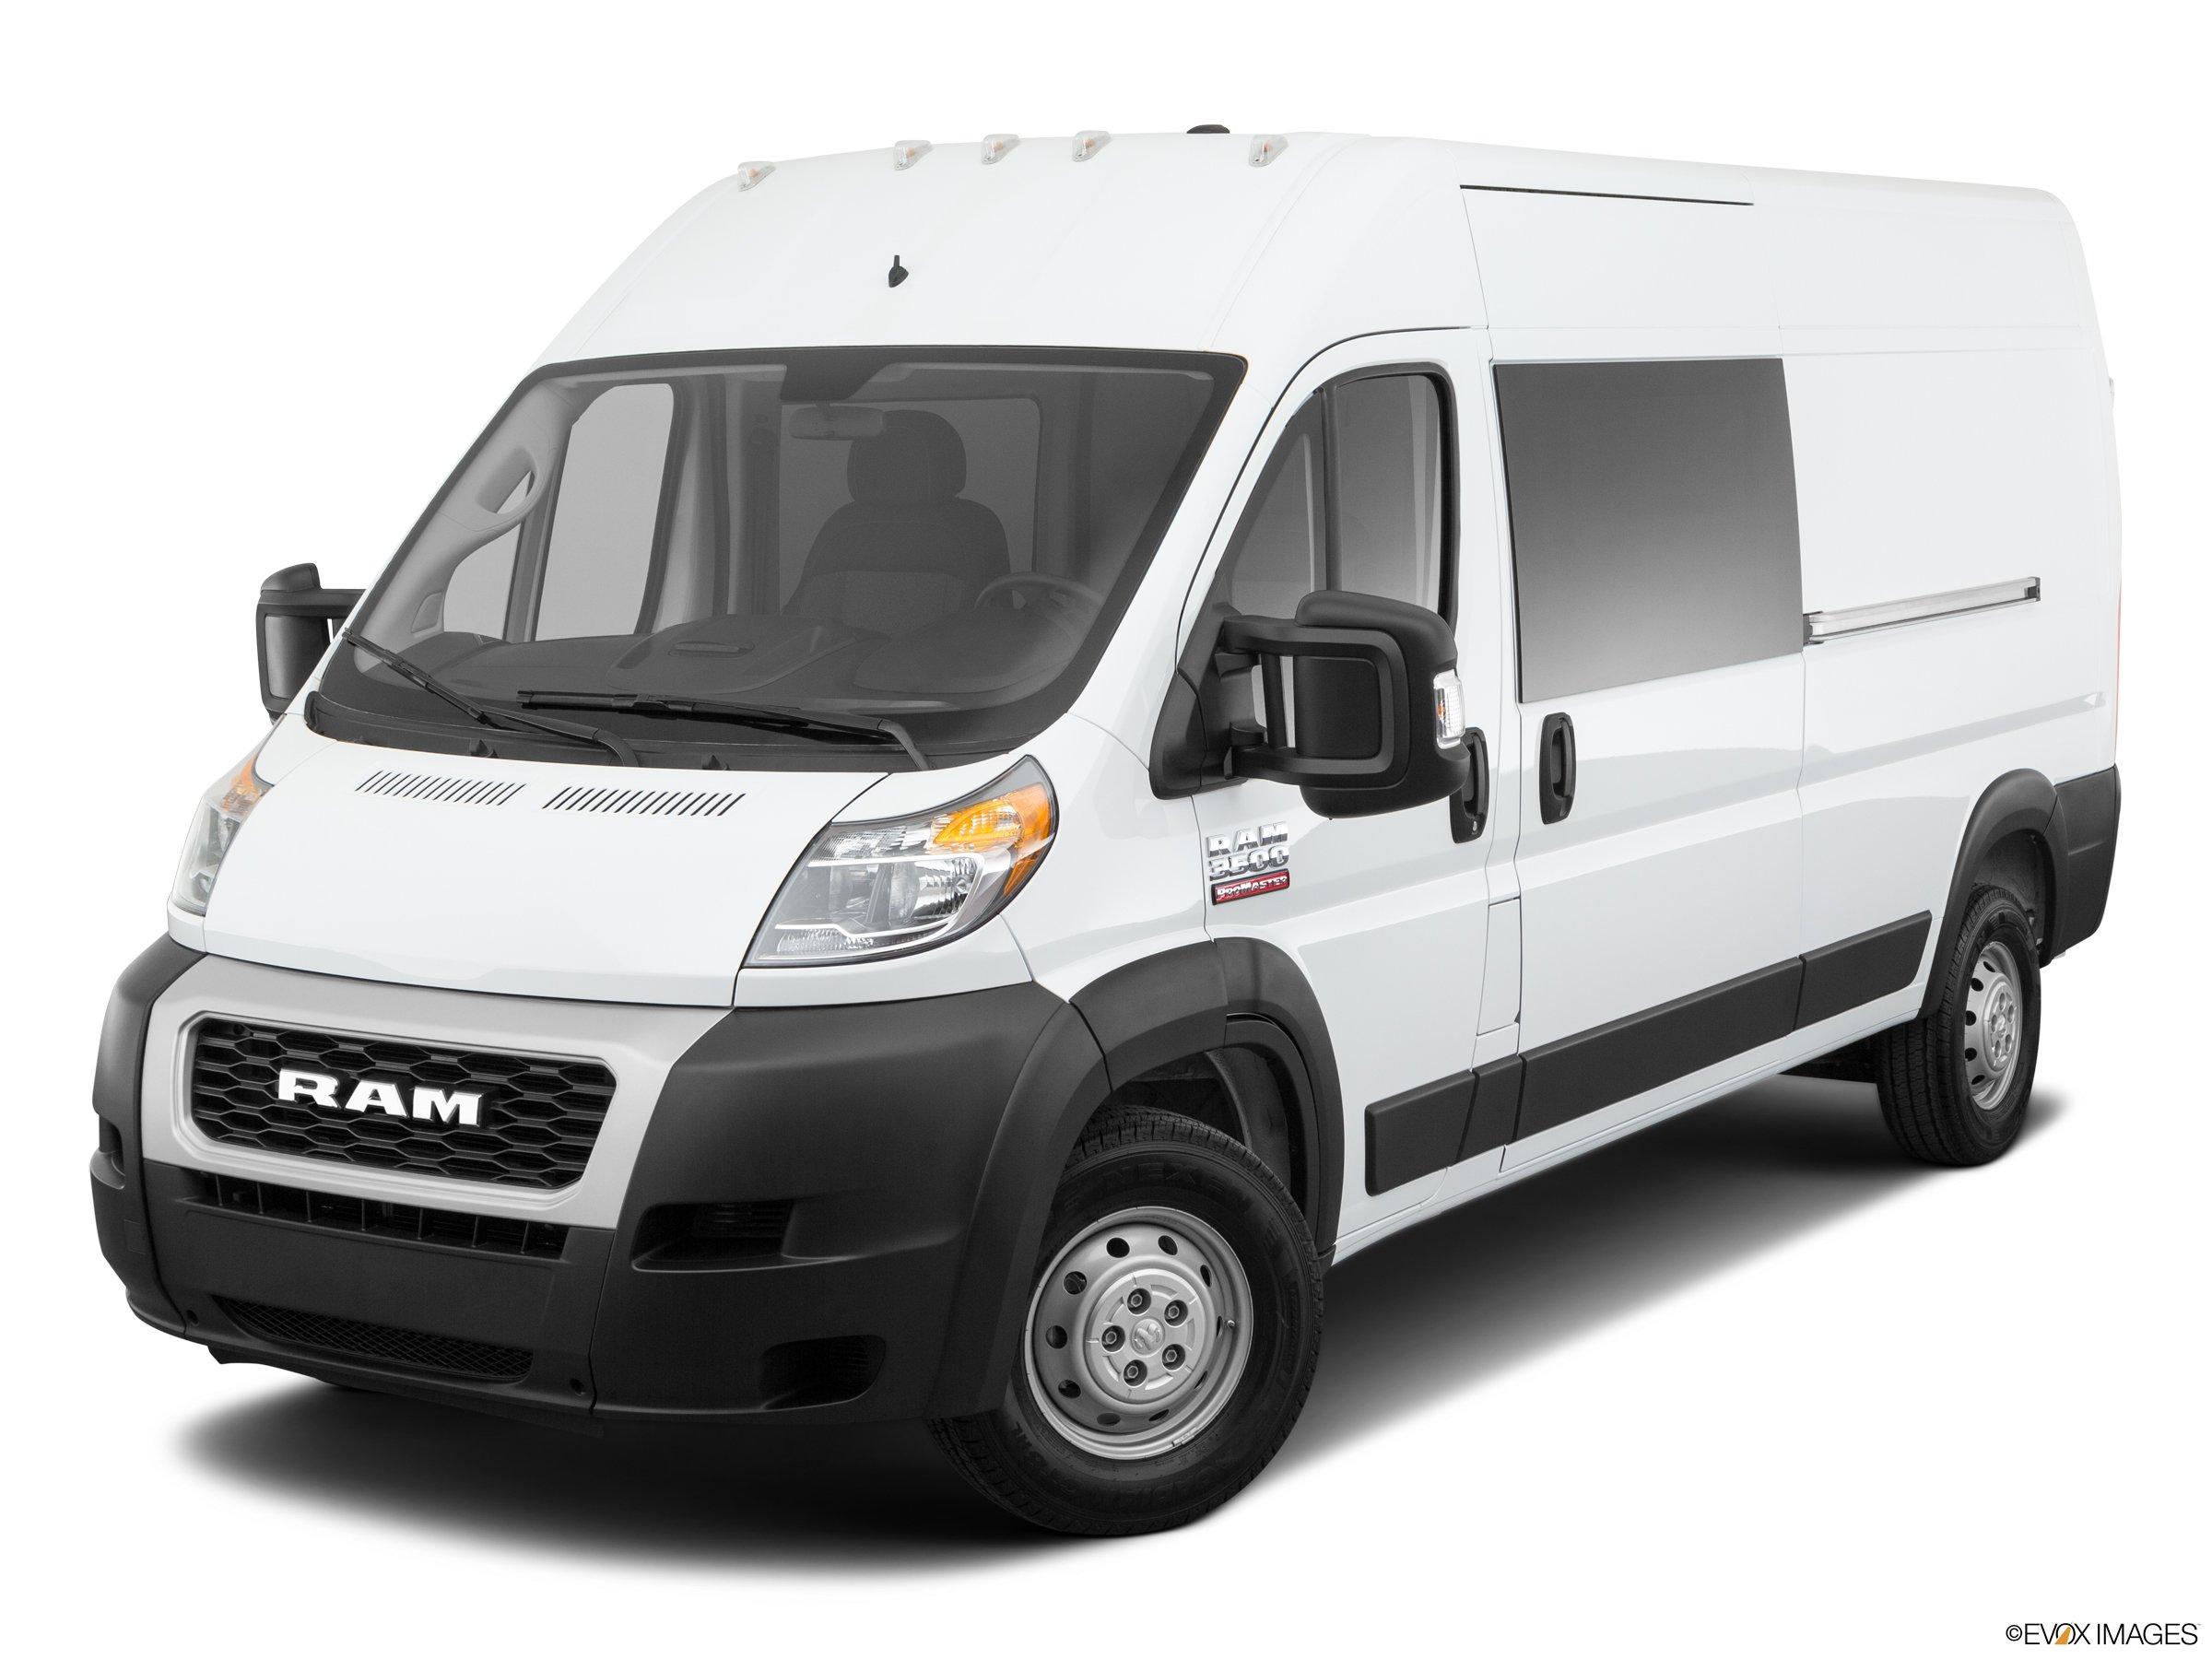 2020 RAM ProMaster 3500 Cargo High Roof 159WB FWD cargo van